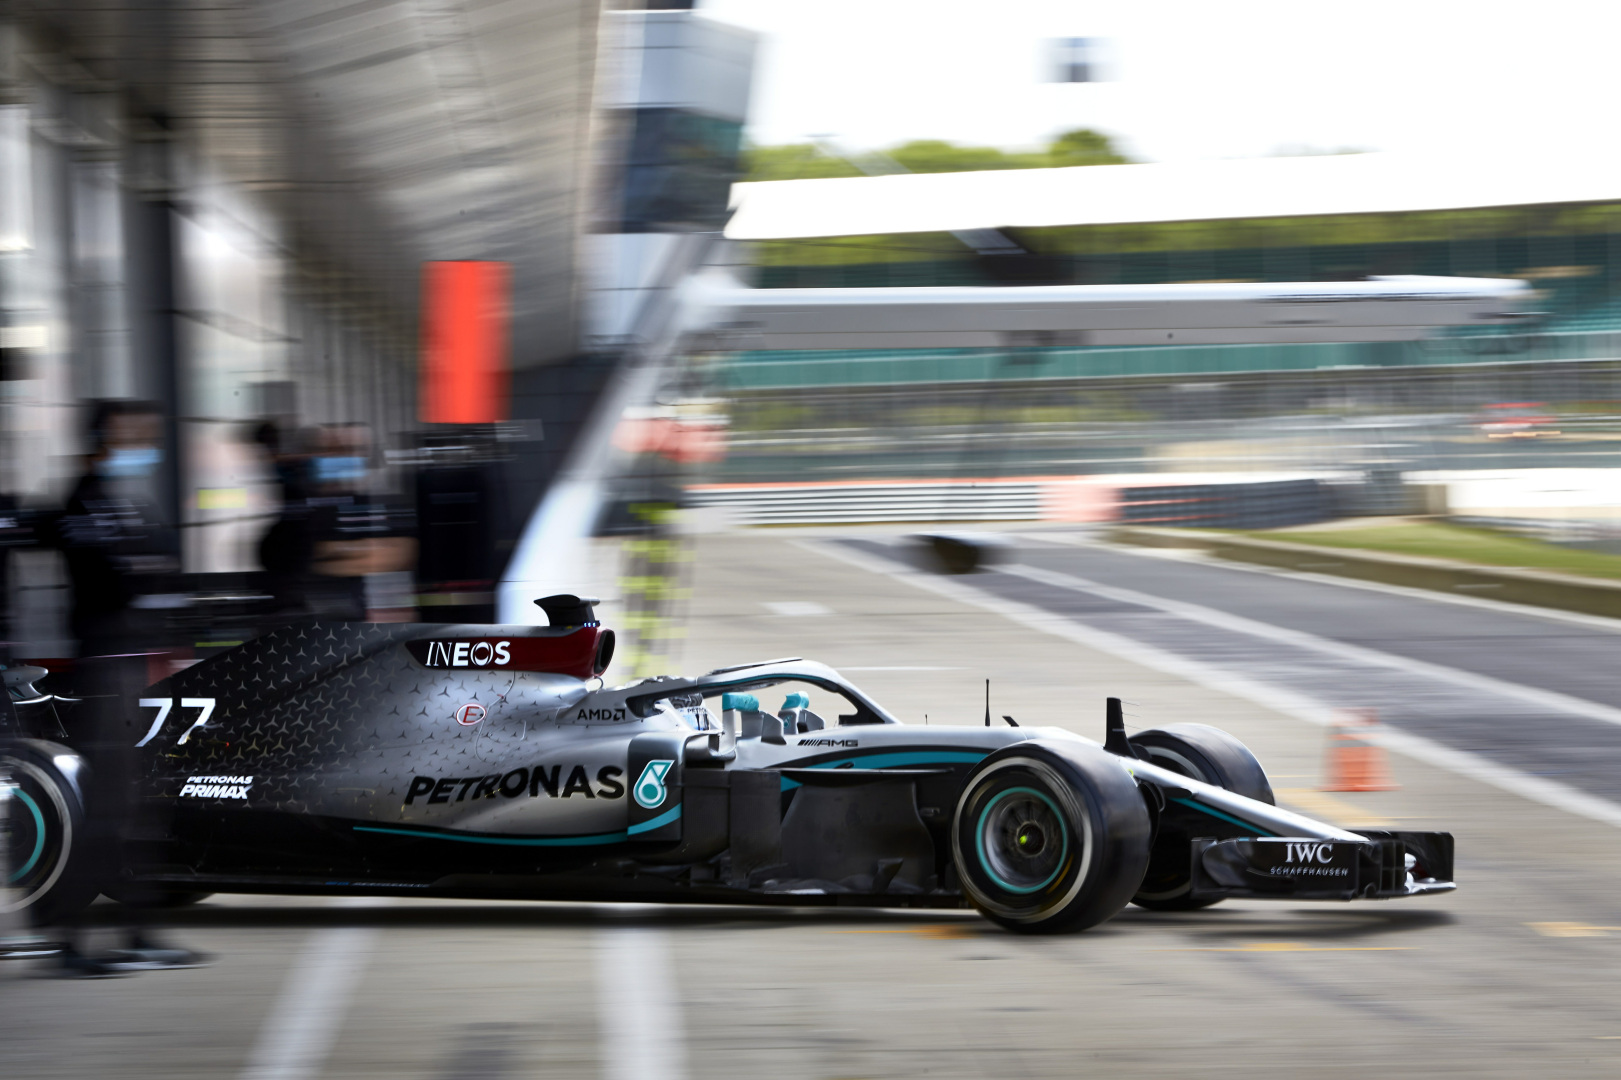 F1 - La police met en garde les fans qui tenteraient de s'approcher de Silverstone